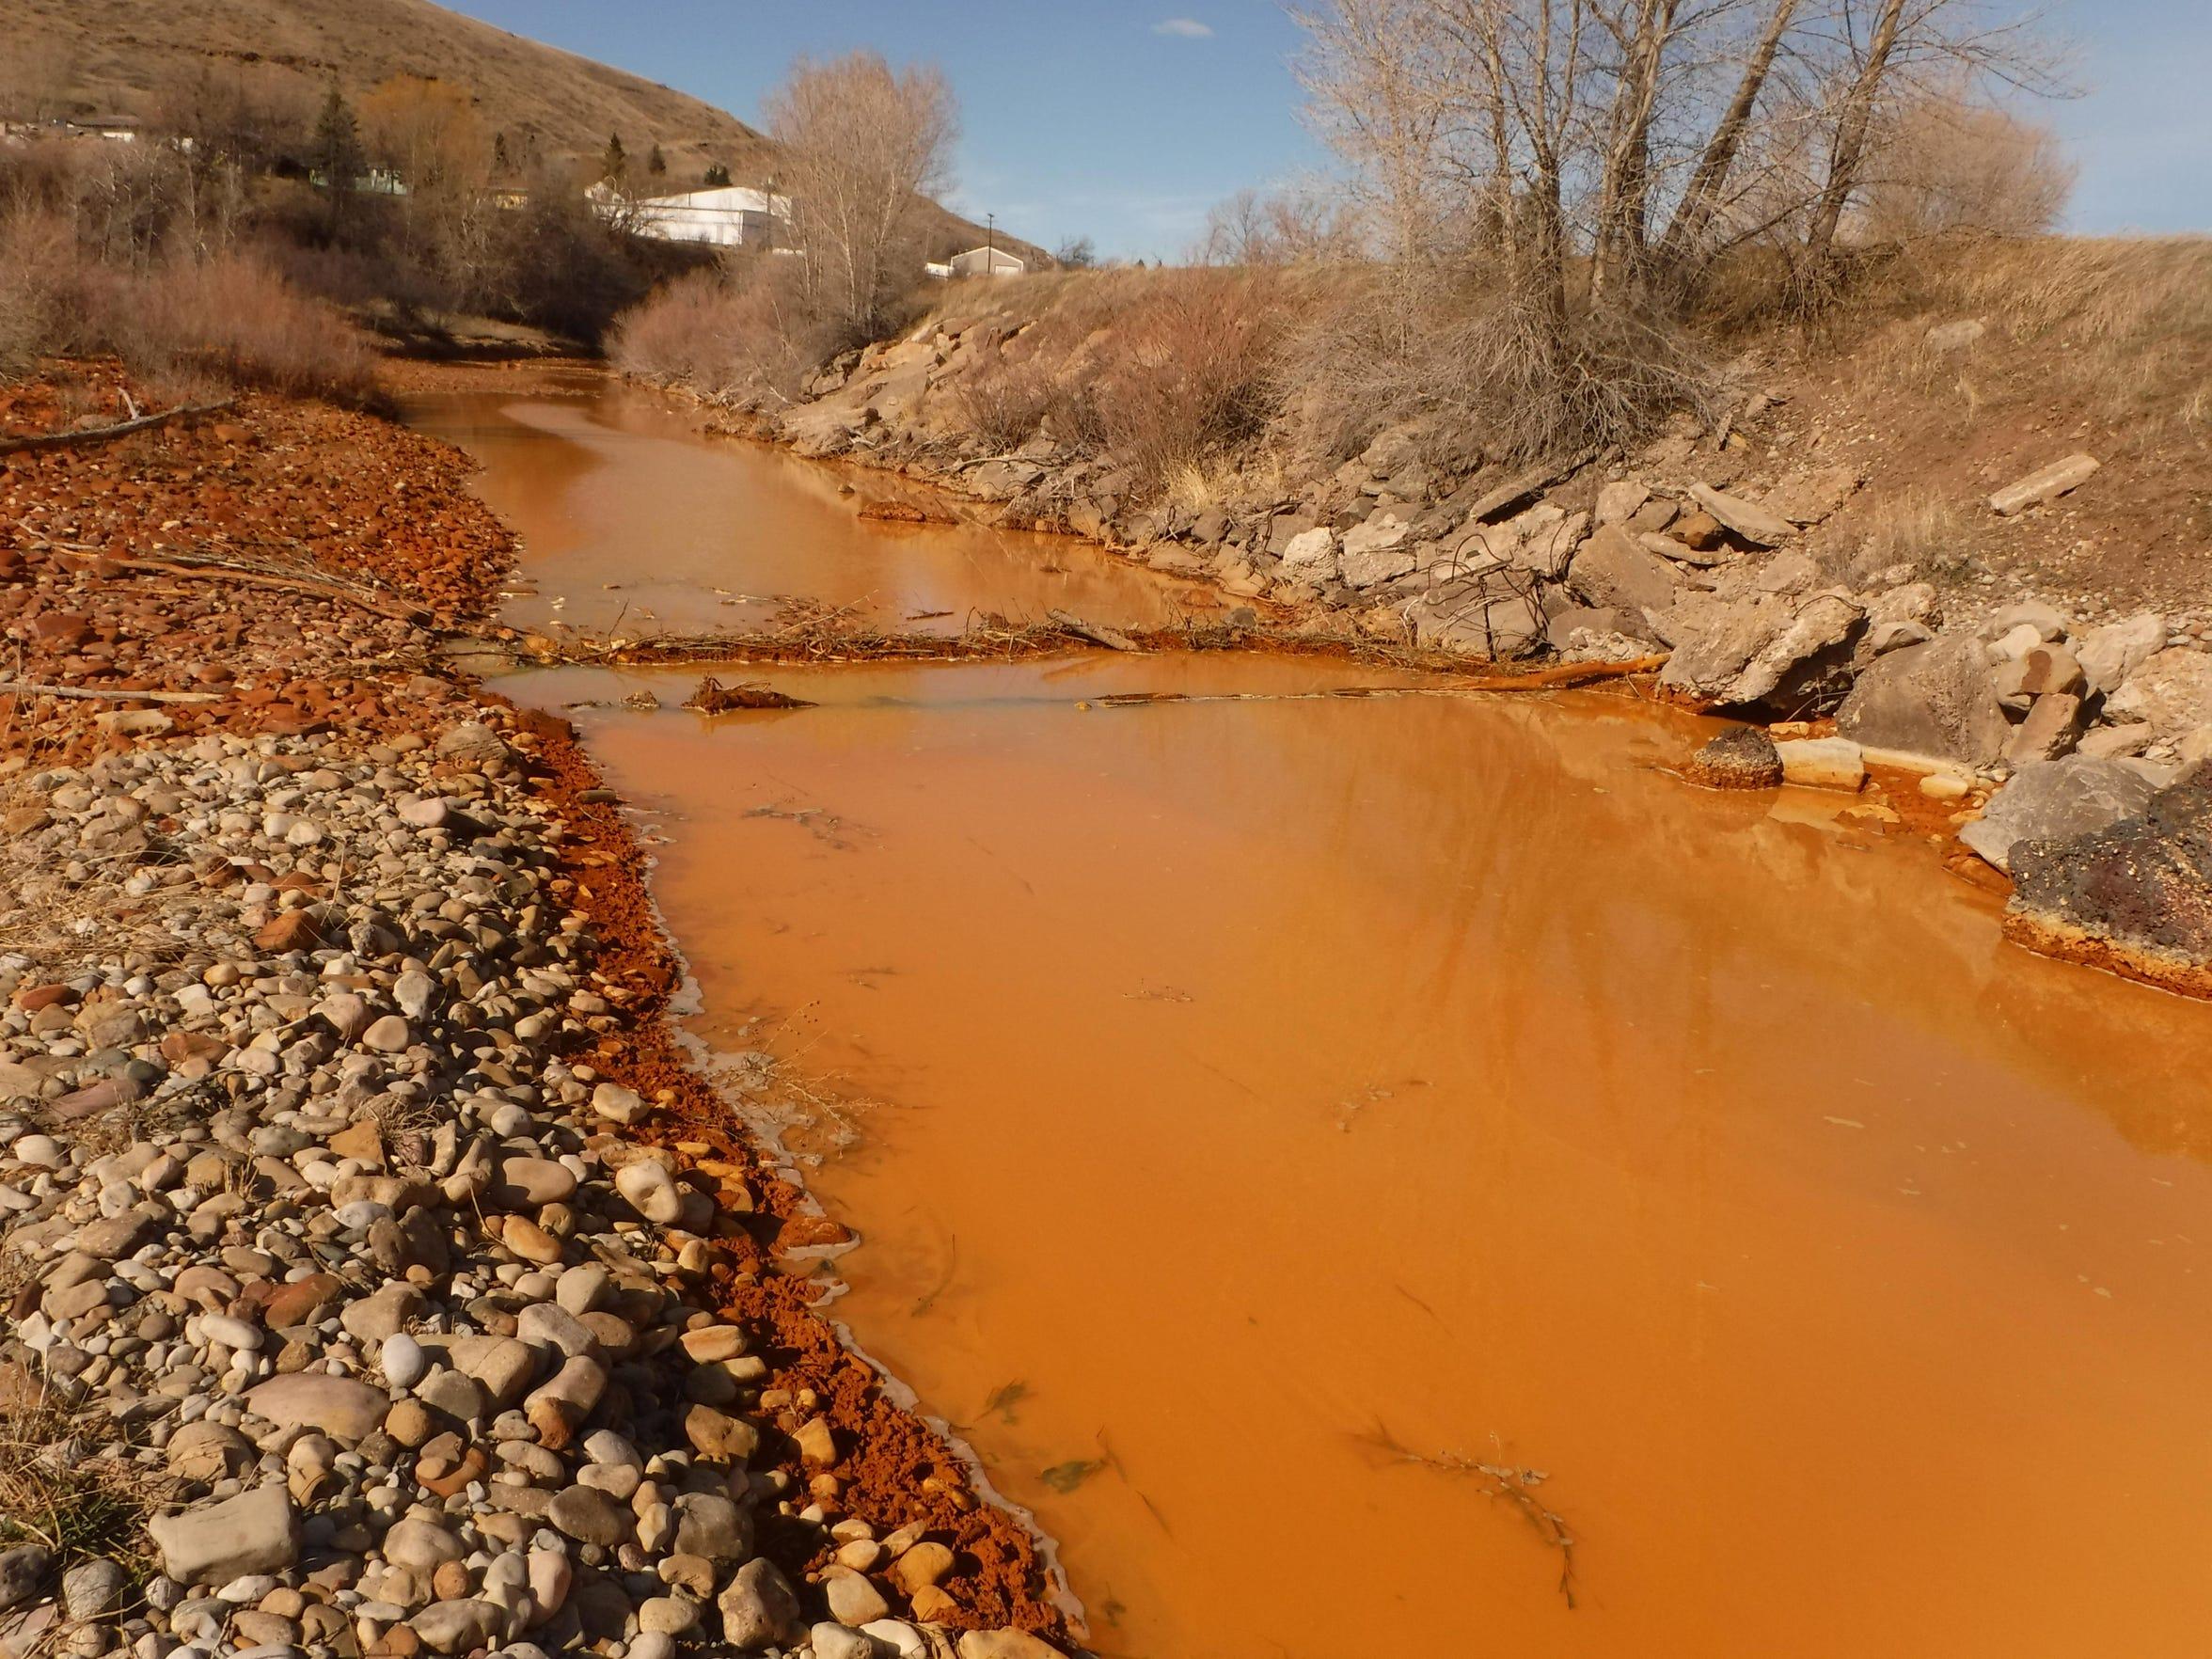 Belt Creek often runs orange because of drainage from an abandoned coal mine.